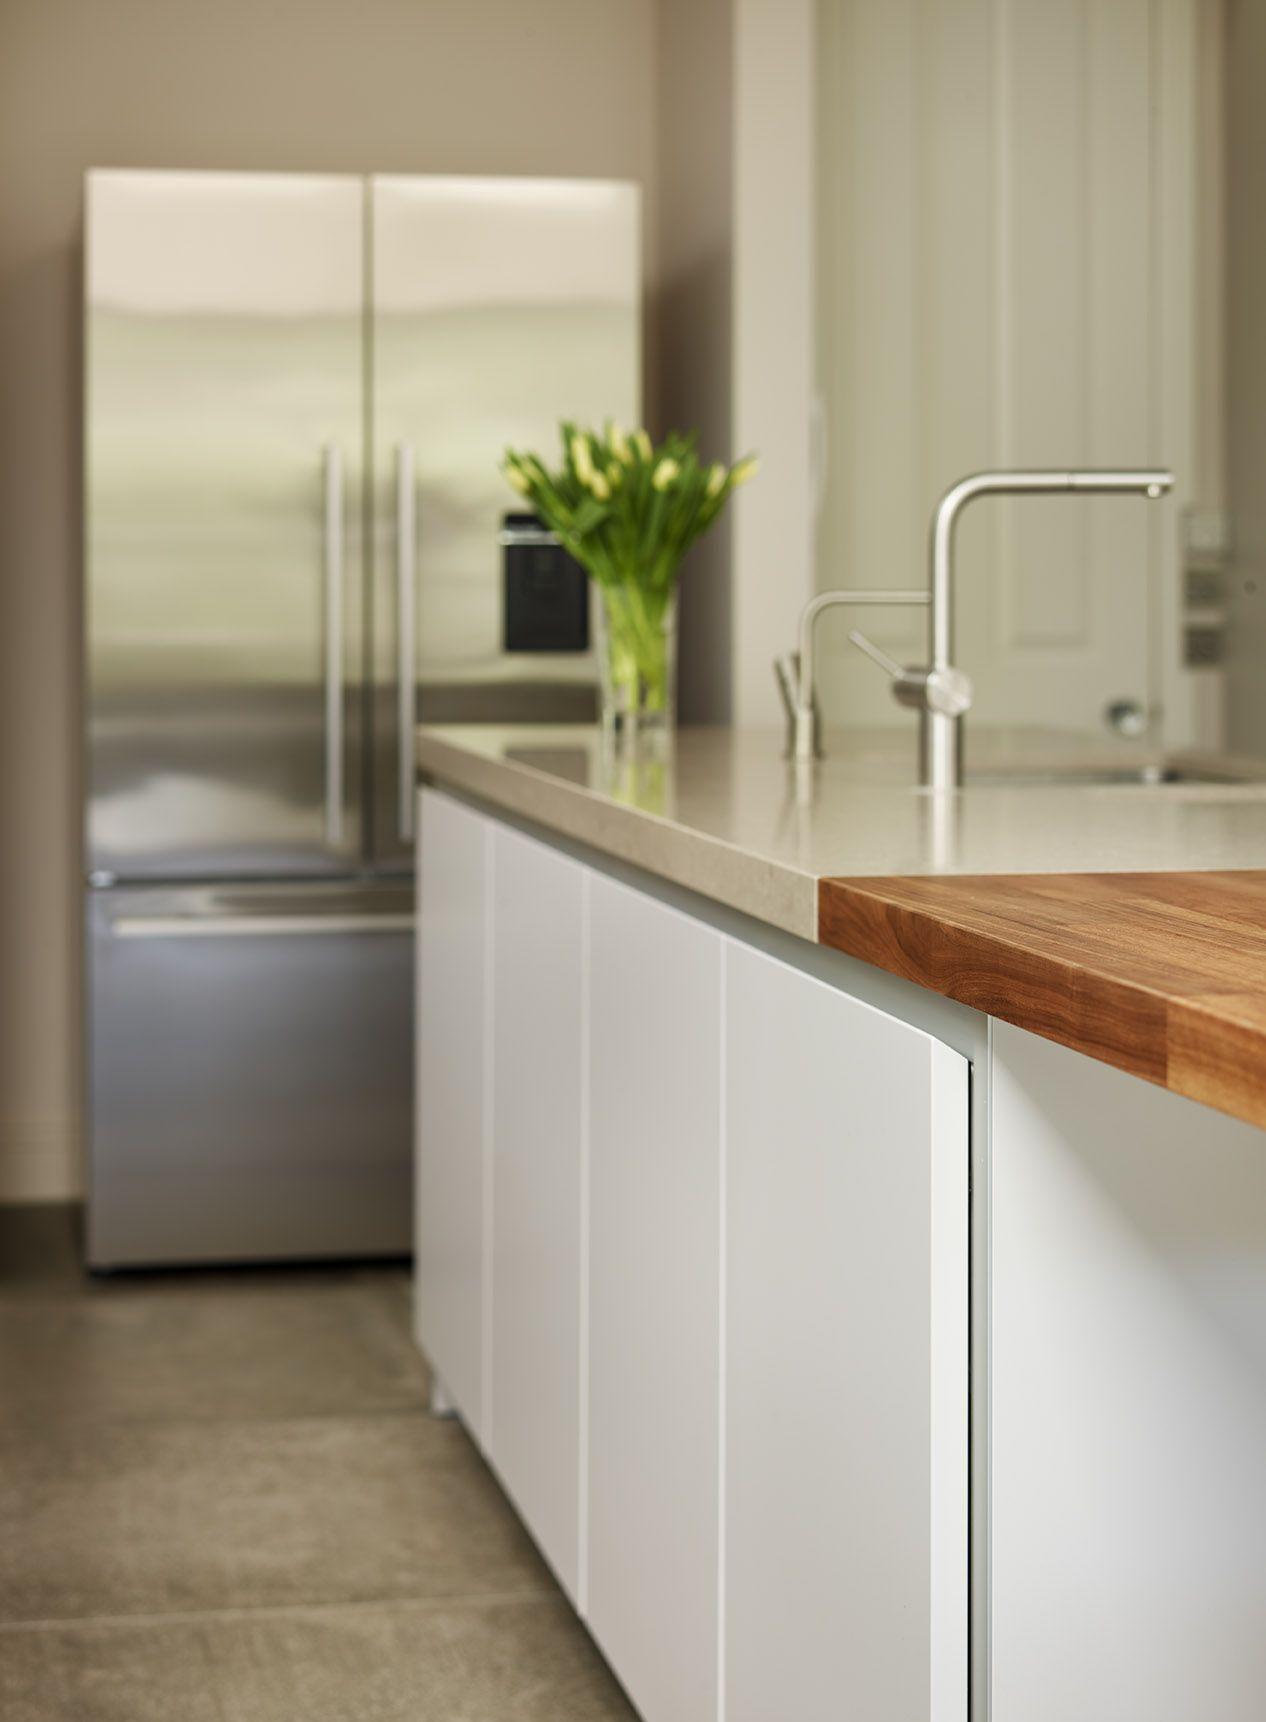 bulthaup by Kitchen Architecture #kitchens #b1 | cucina | Pinterest ...